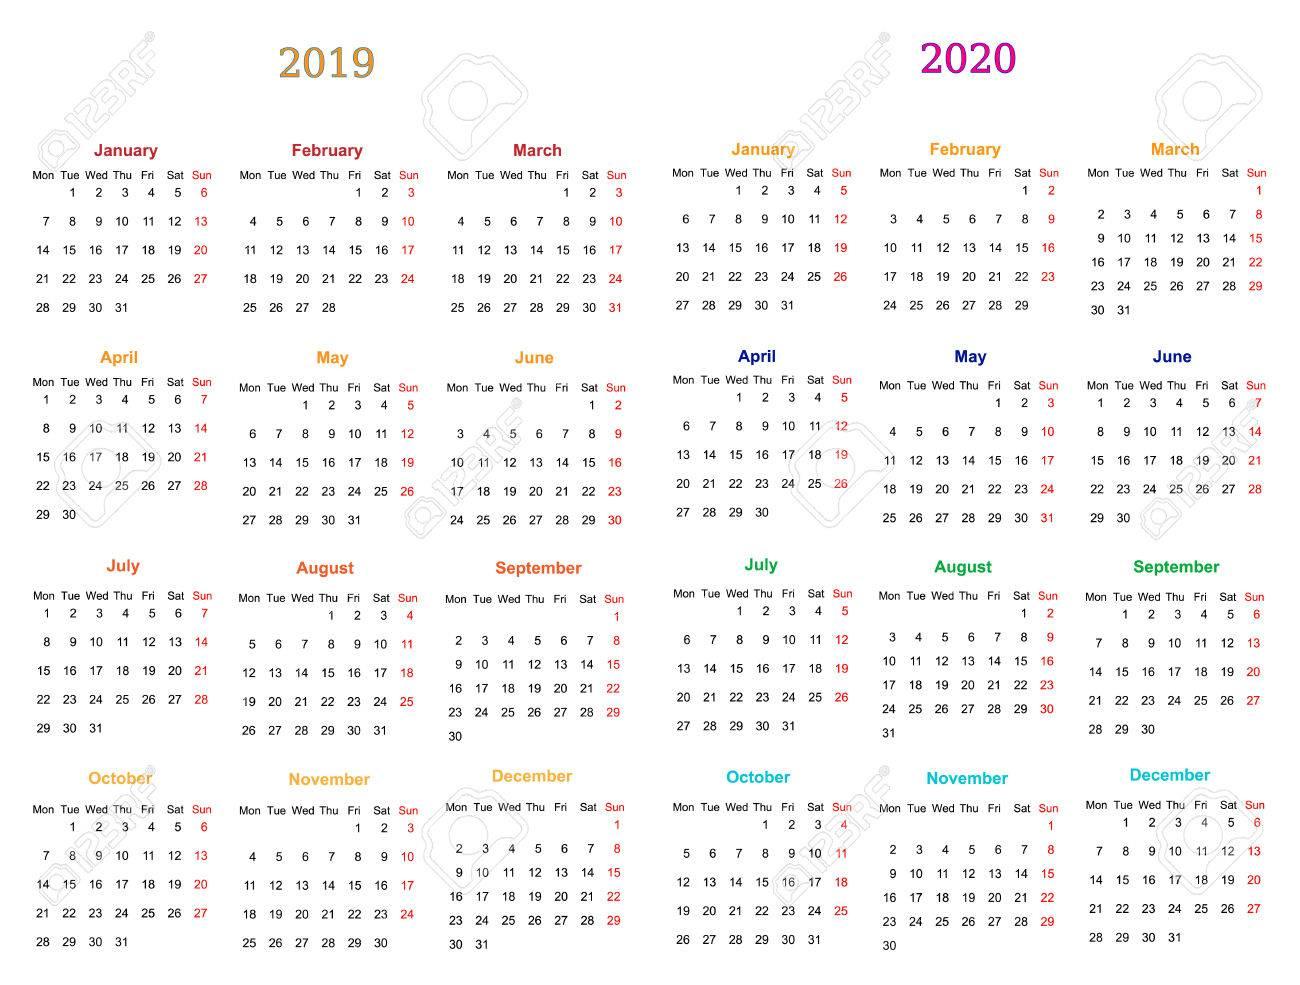 Calendario 2020 Editable Illustrator.12 Months Calendar Design 2019 2020 Printable And Editable